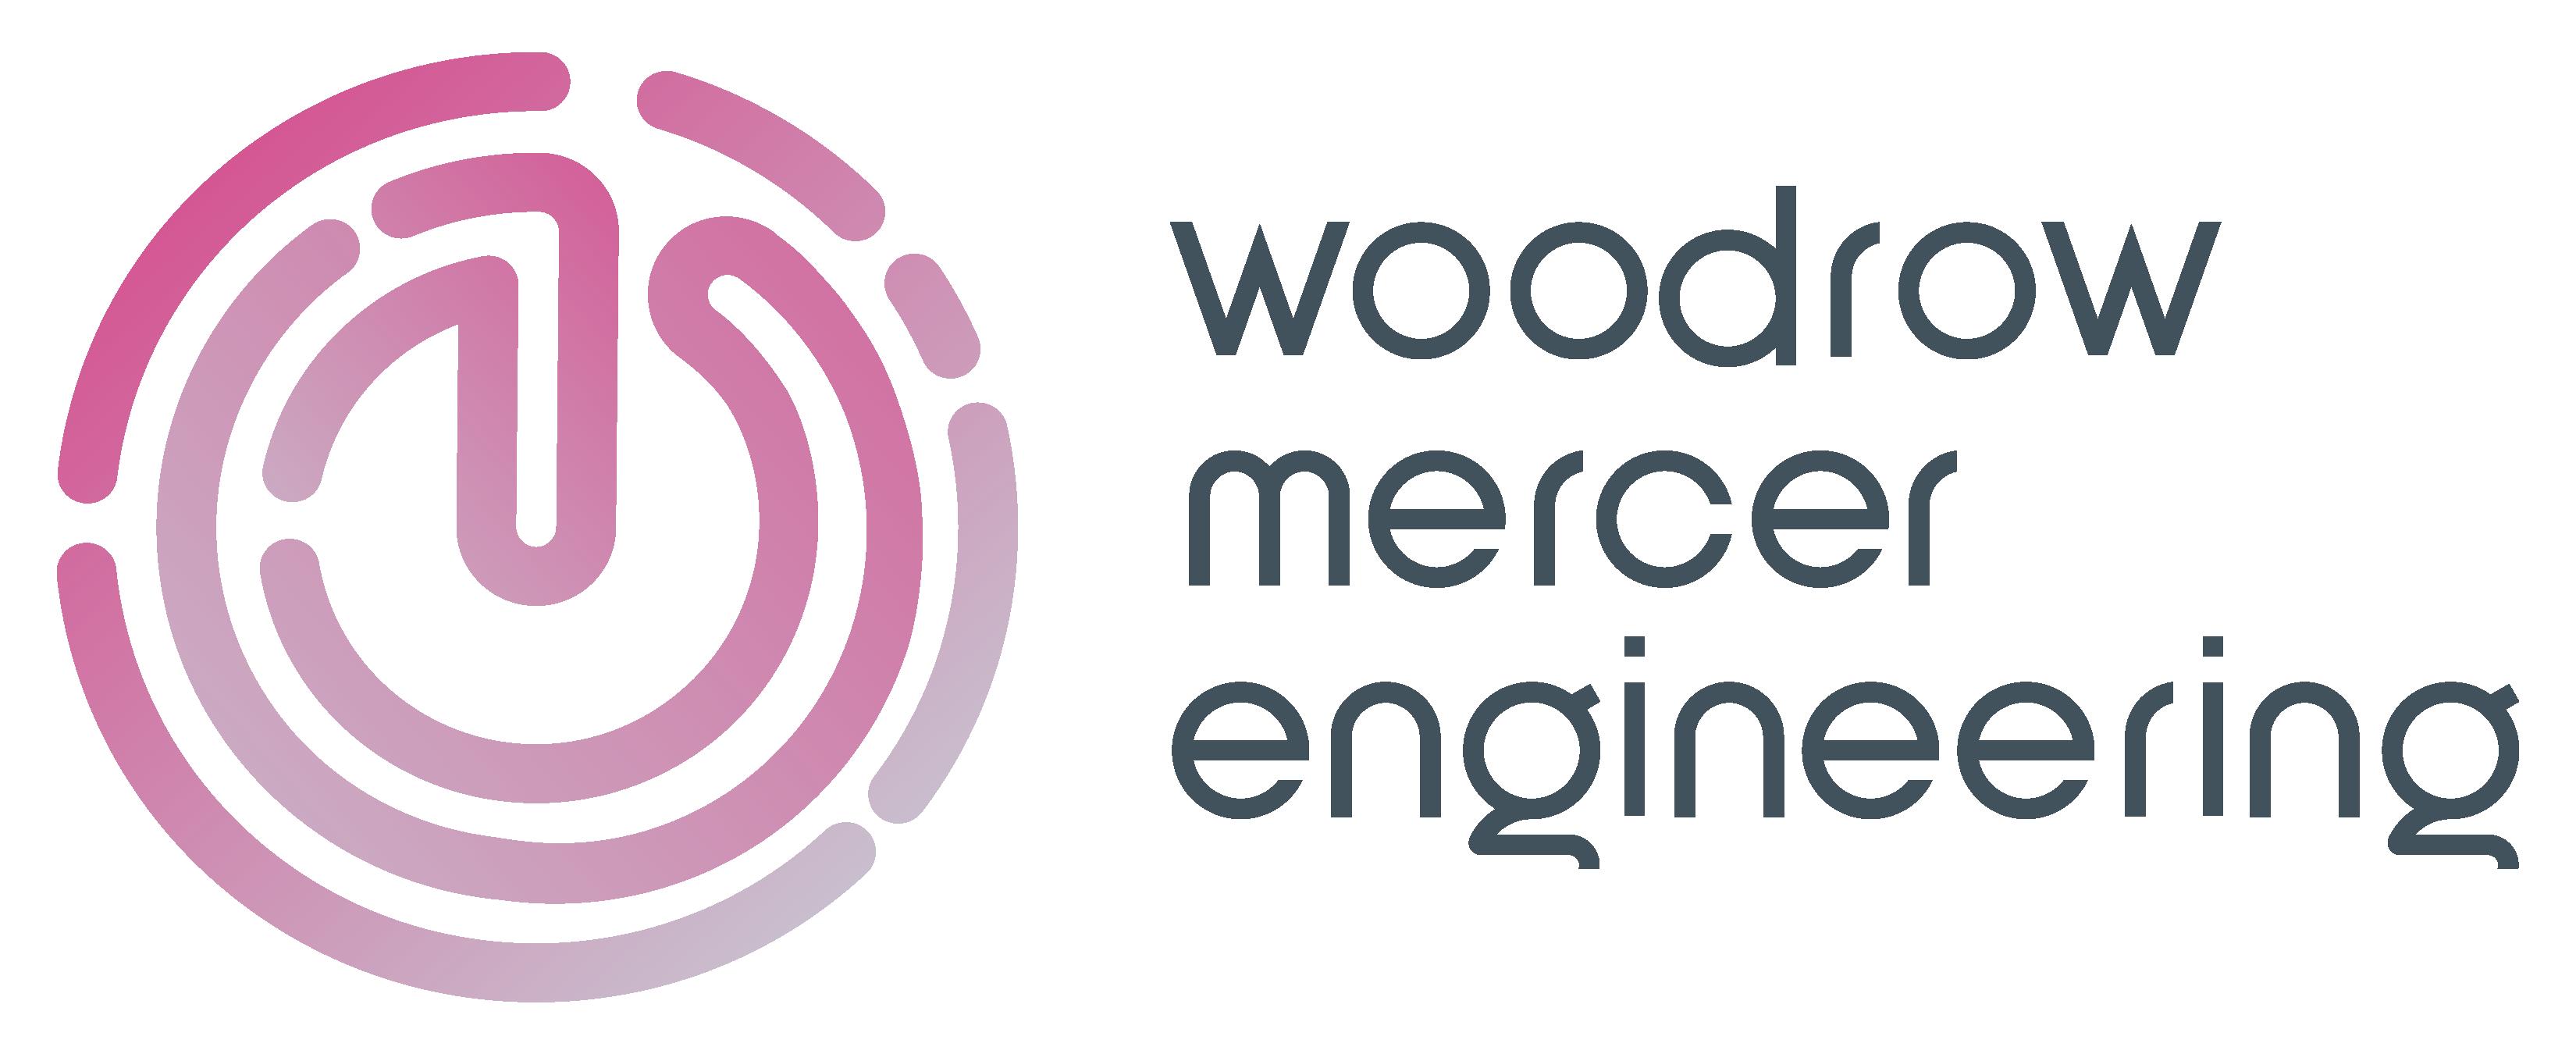 wmengineering_logo.png